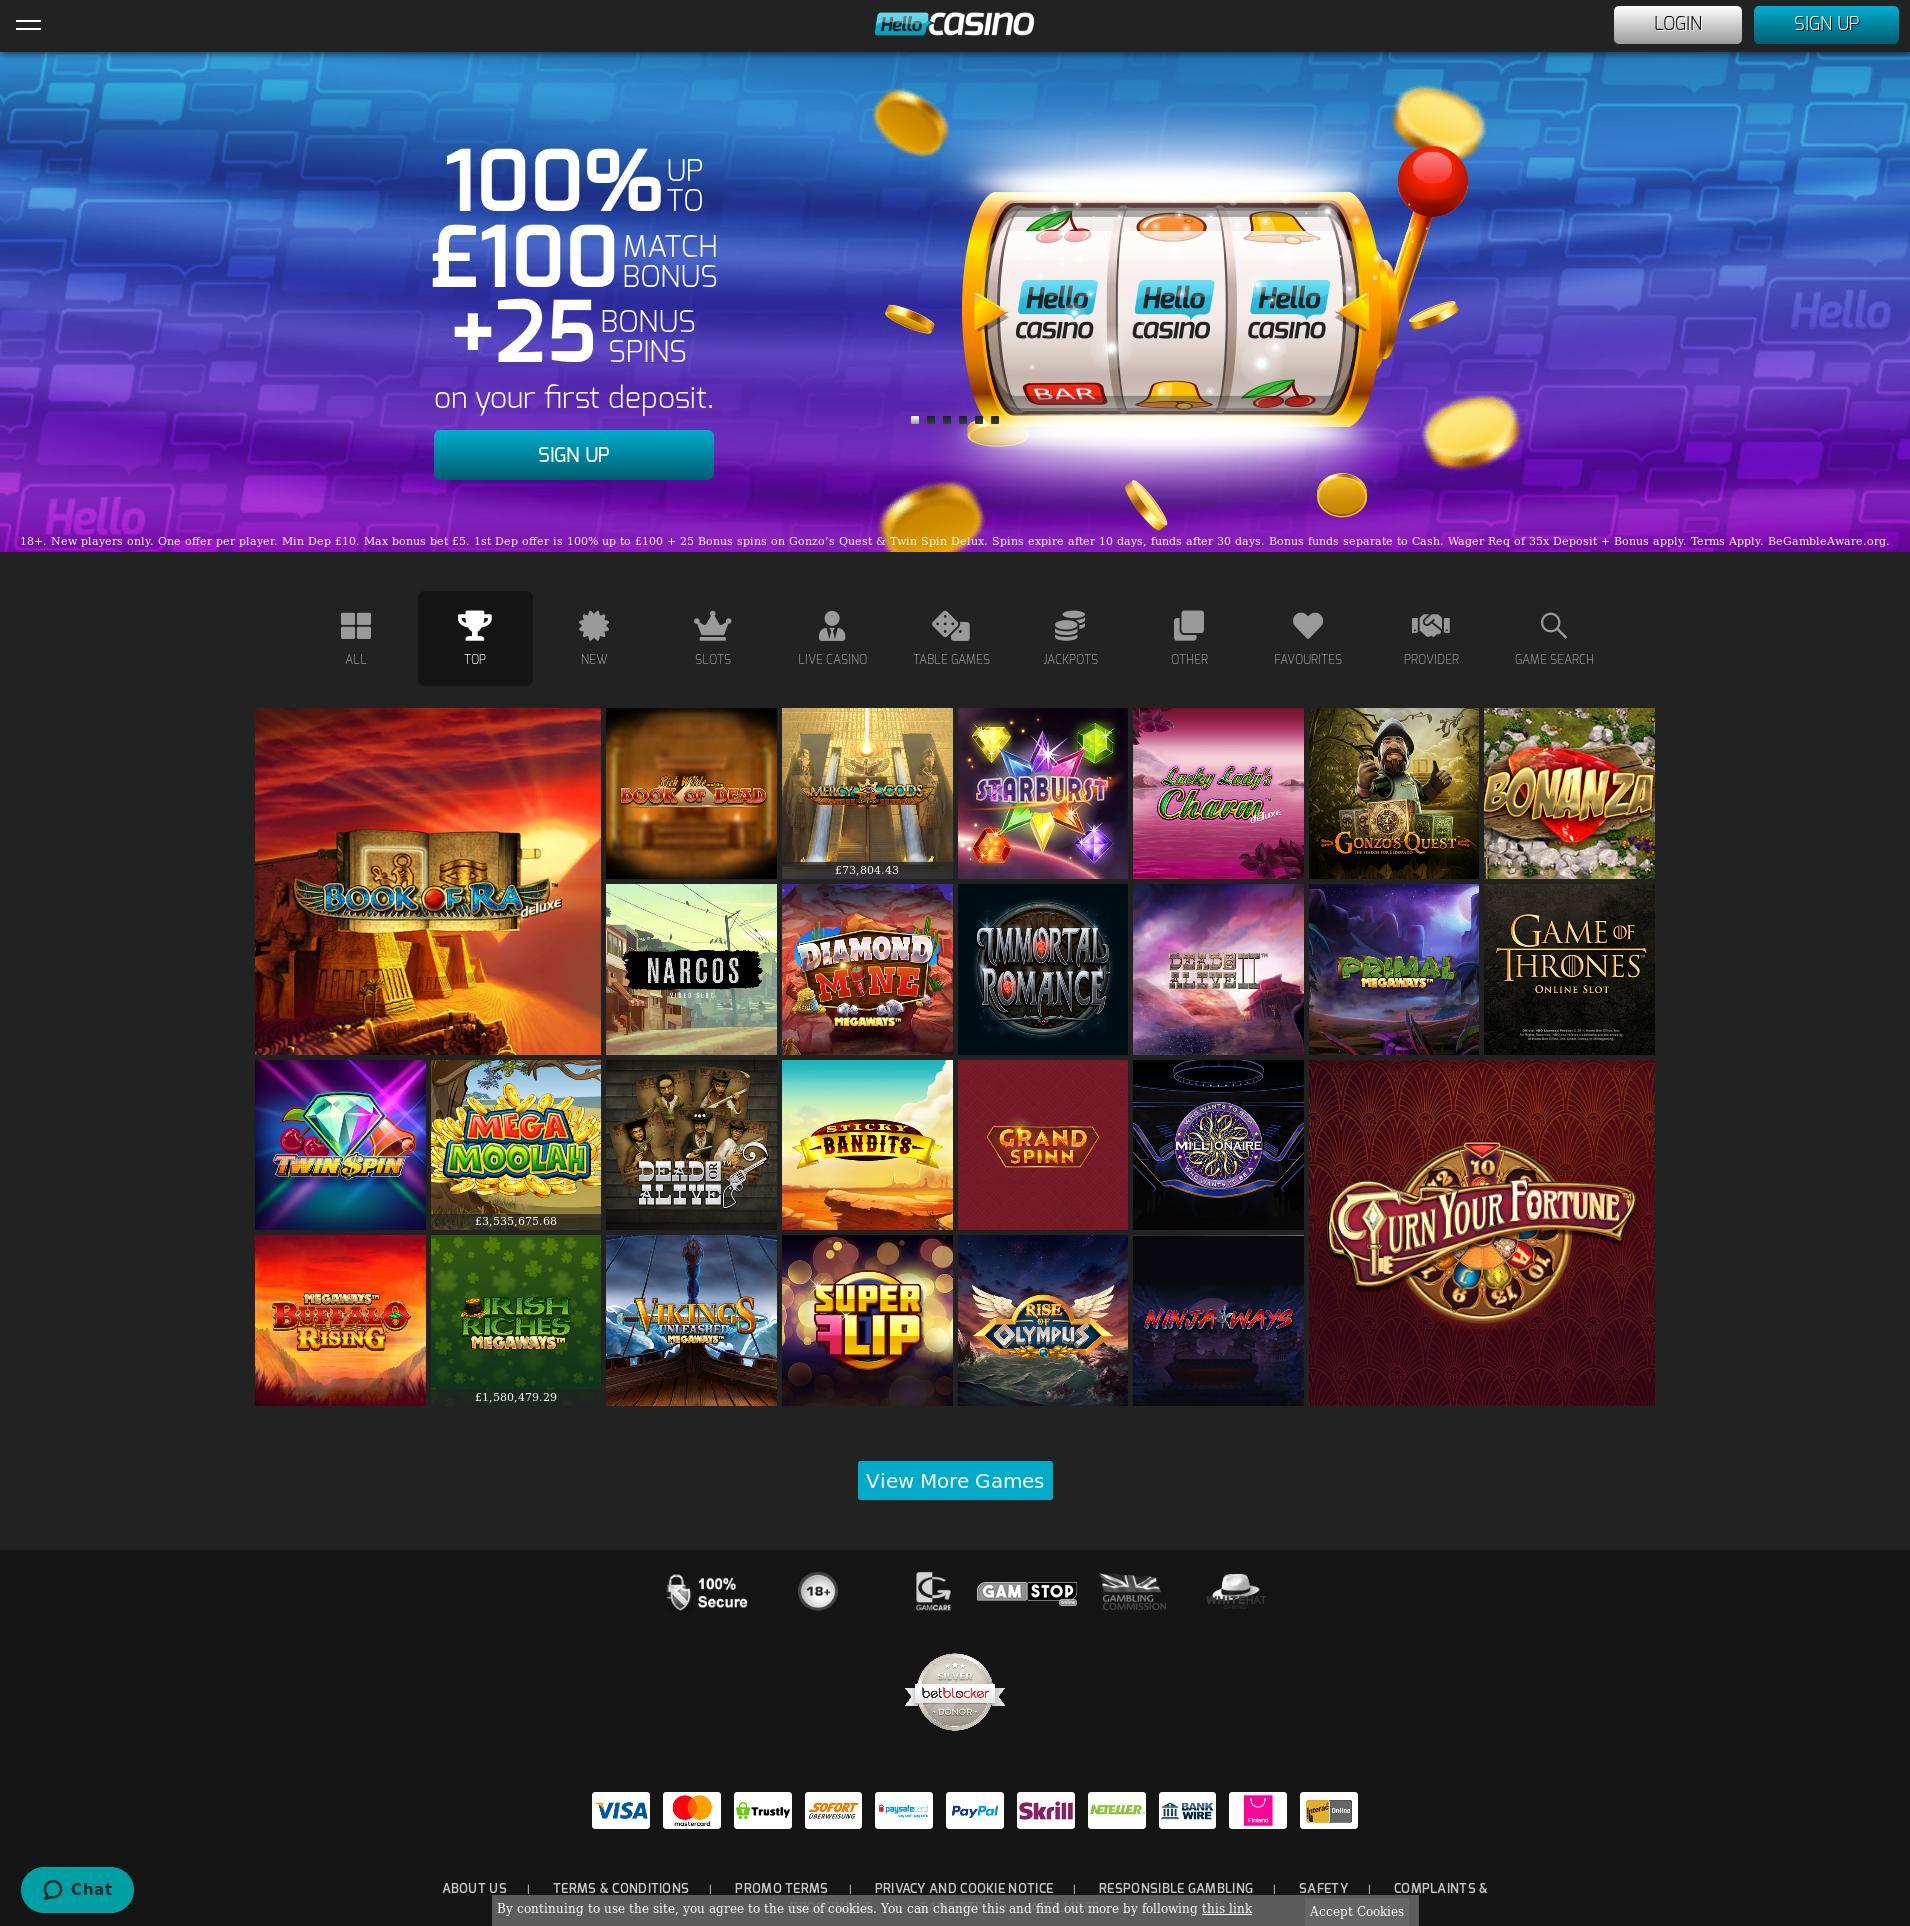 Casino screen Lobby 2020-06-06 for United Kingdom